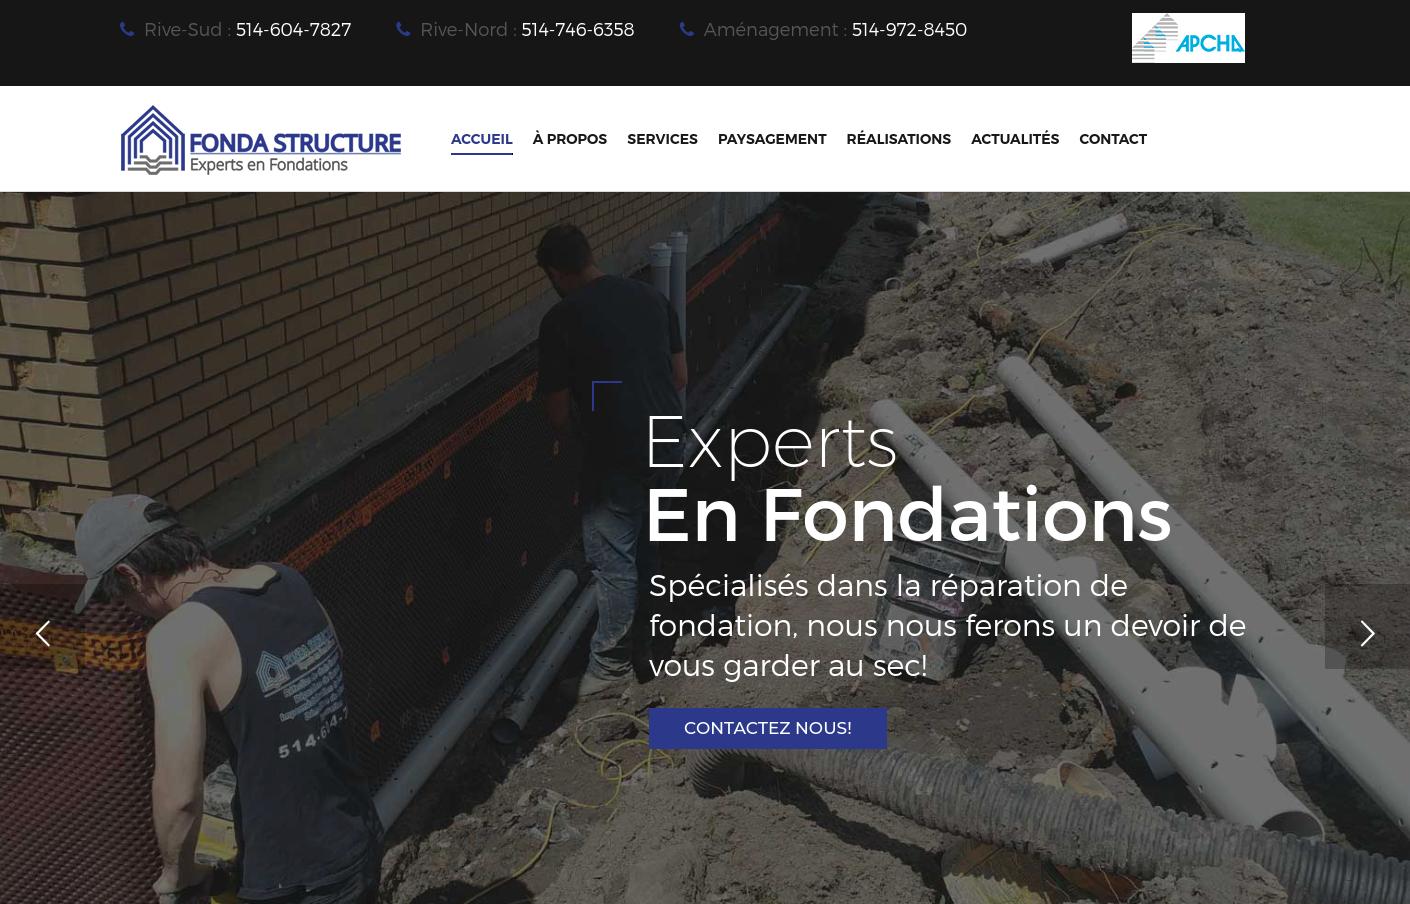 Fondastructure.com